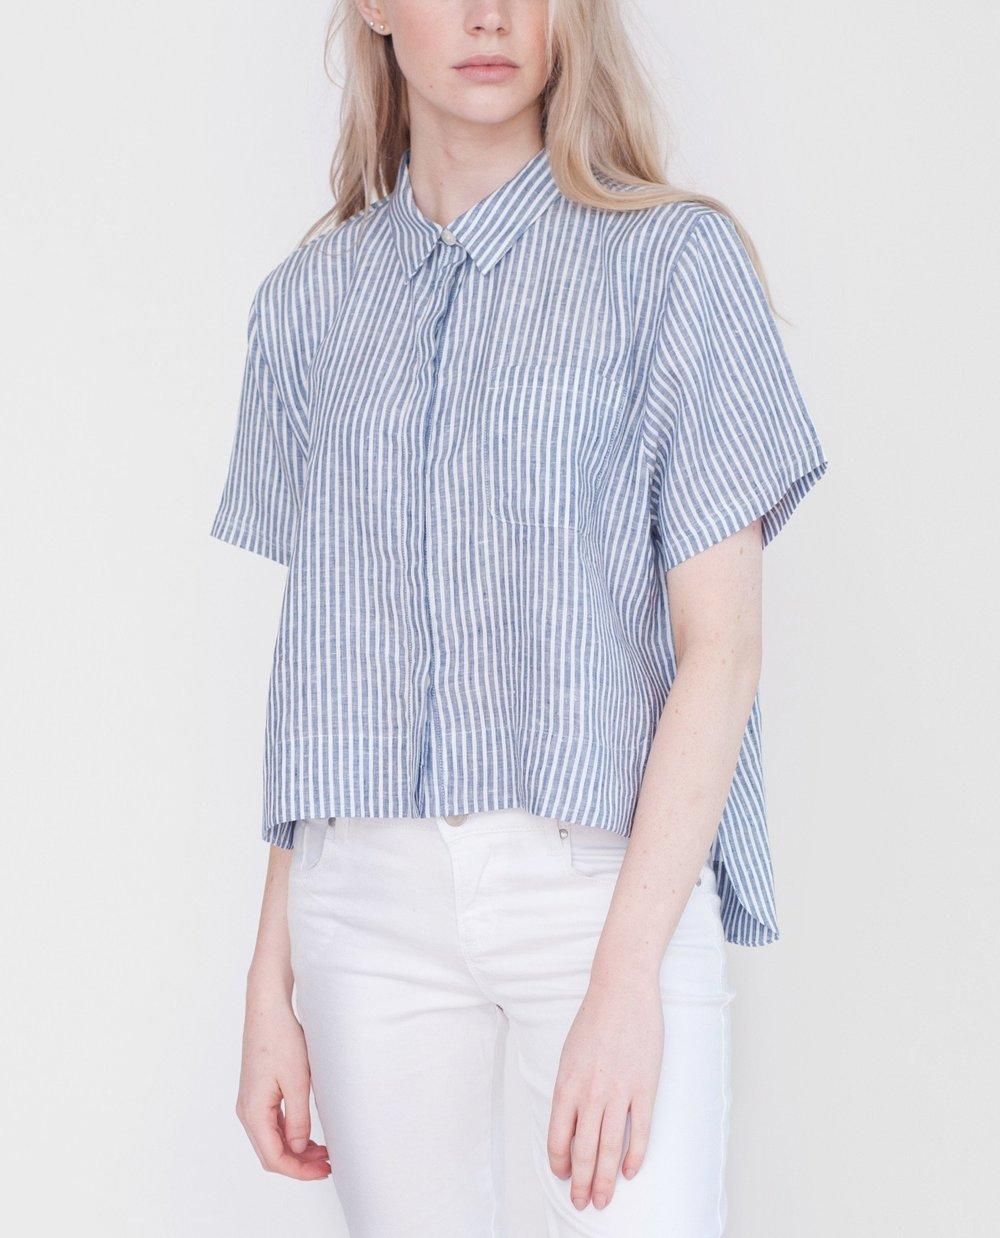 Brynlee-Beaumont-Organic-Linen-Striped-Shirt-1.jpg